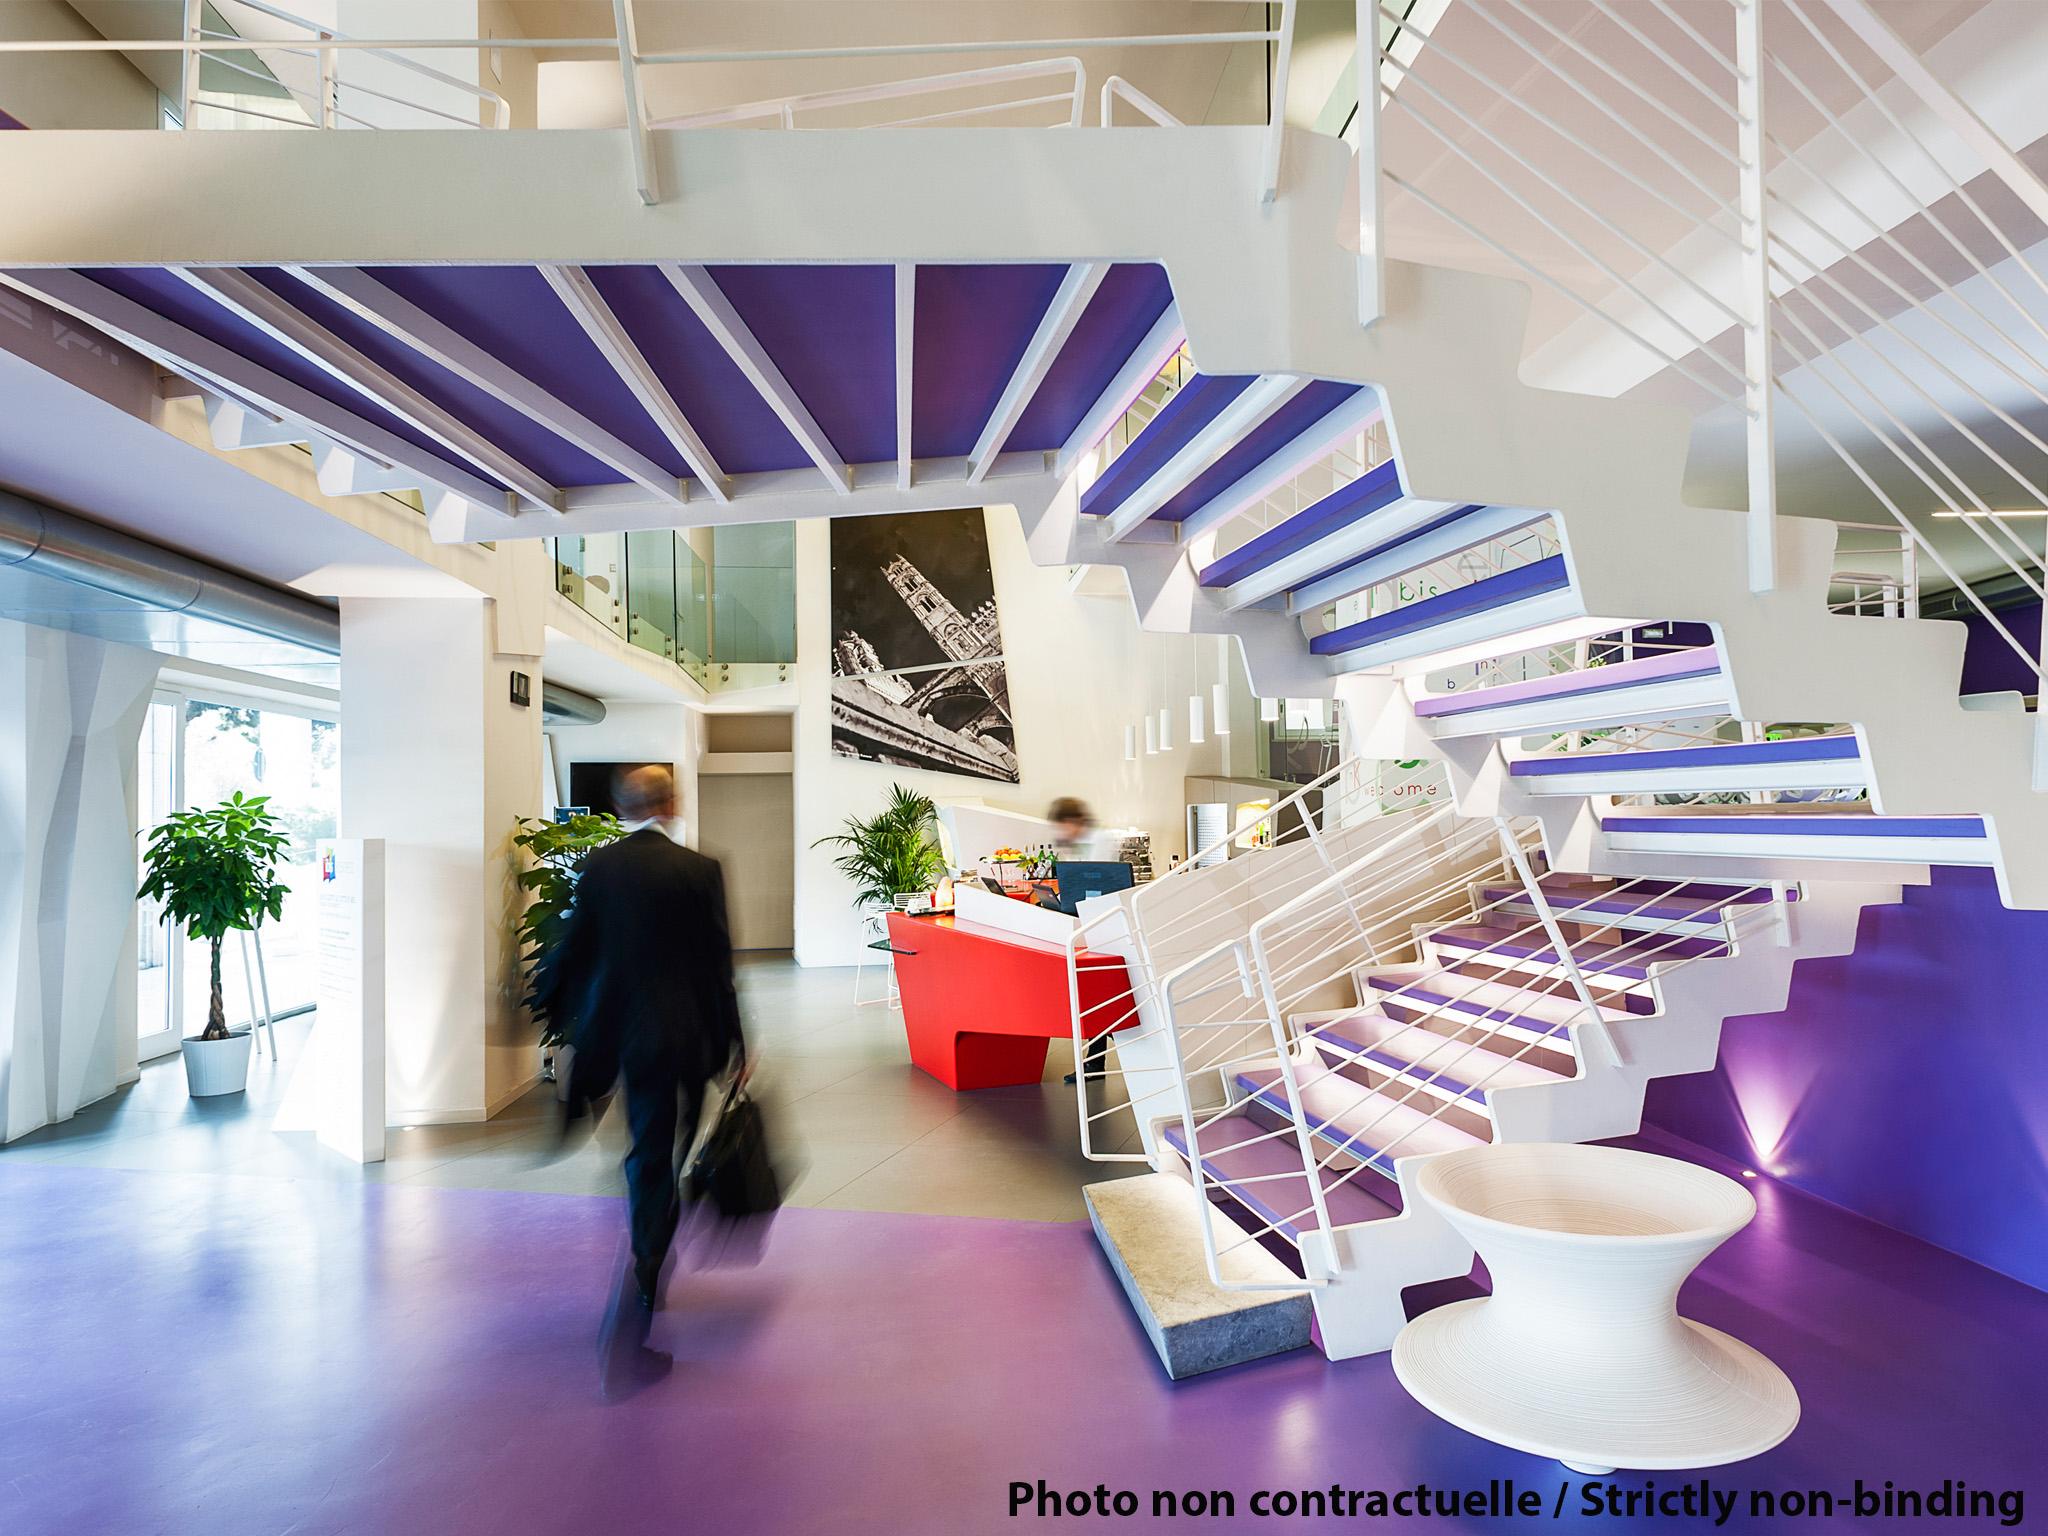 Отель — ibis Styles Douai Gare Gayant Expo (Opening October 2018)